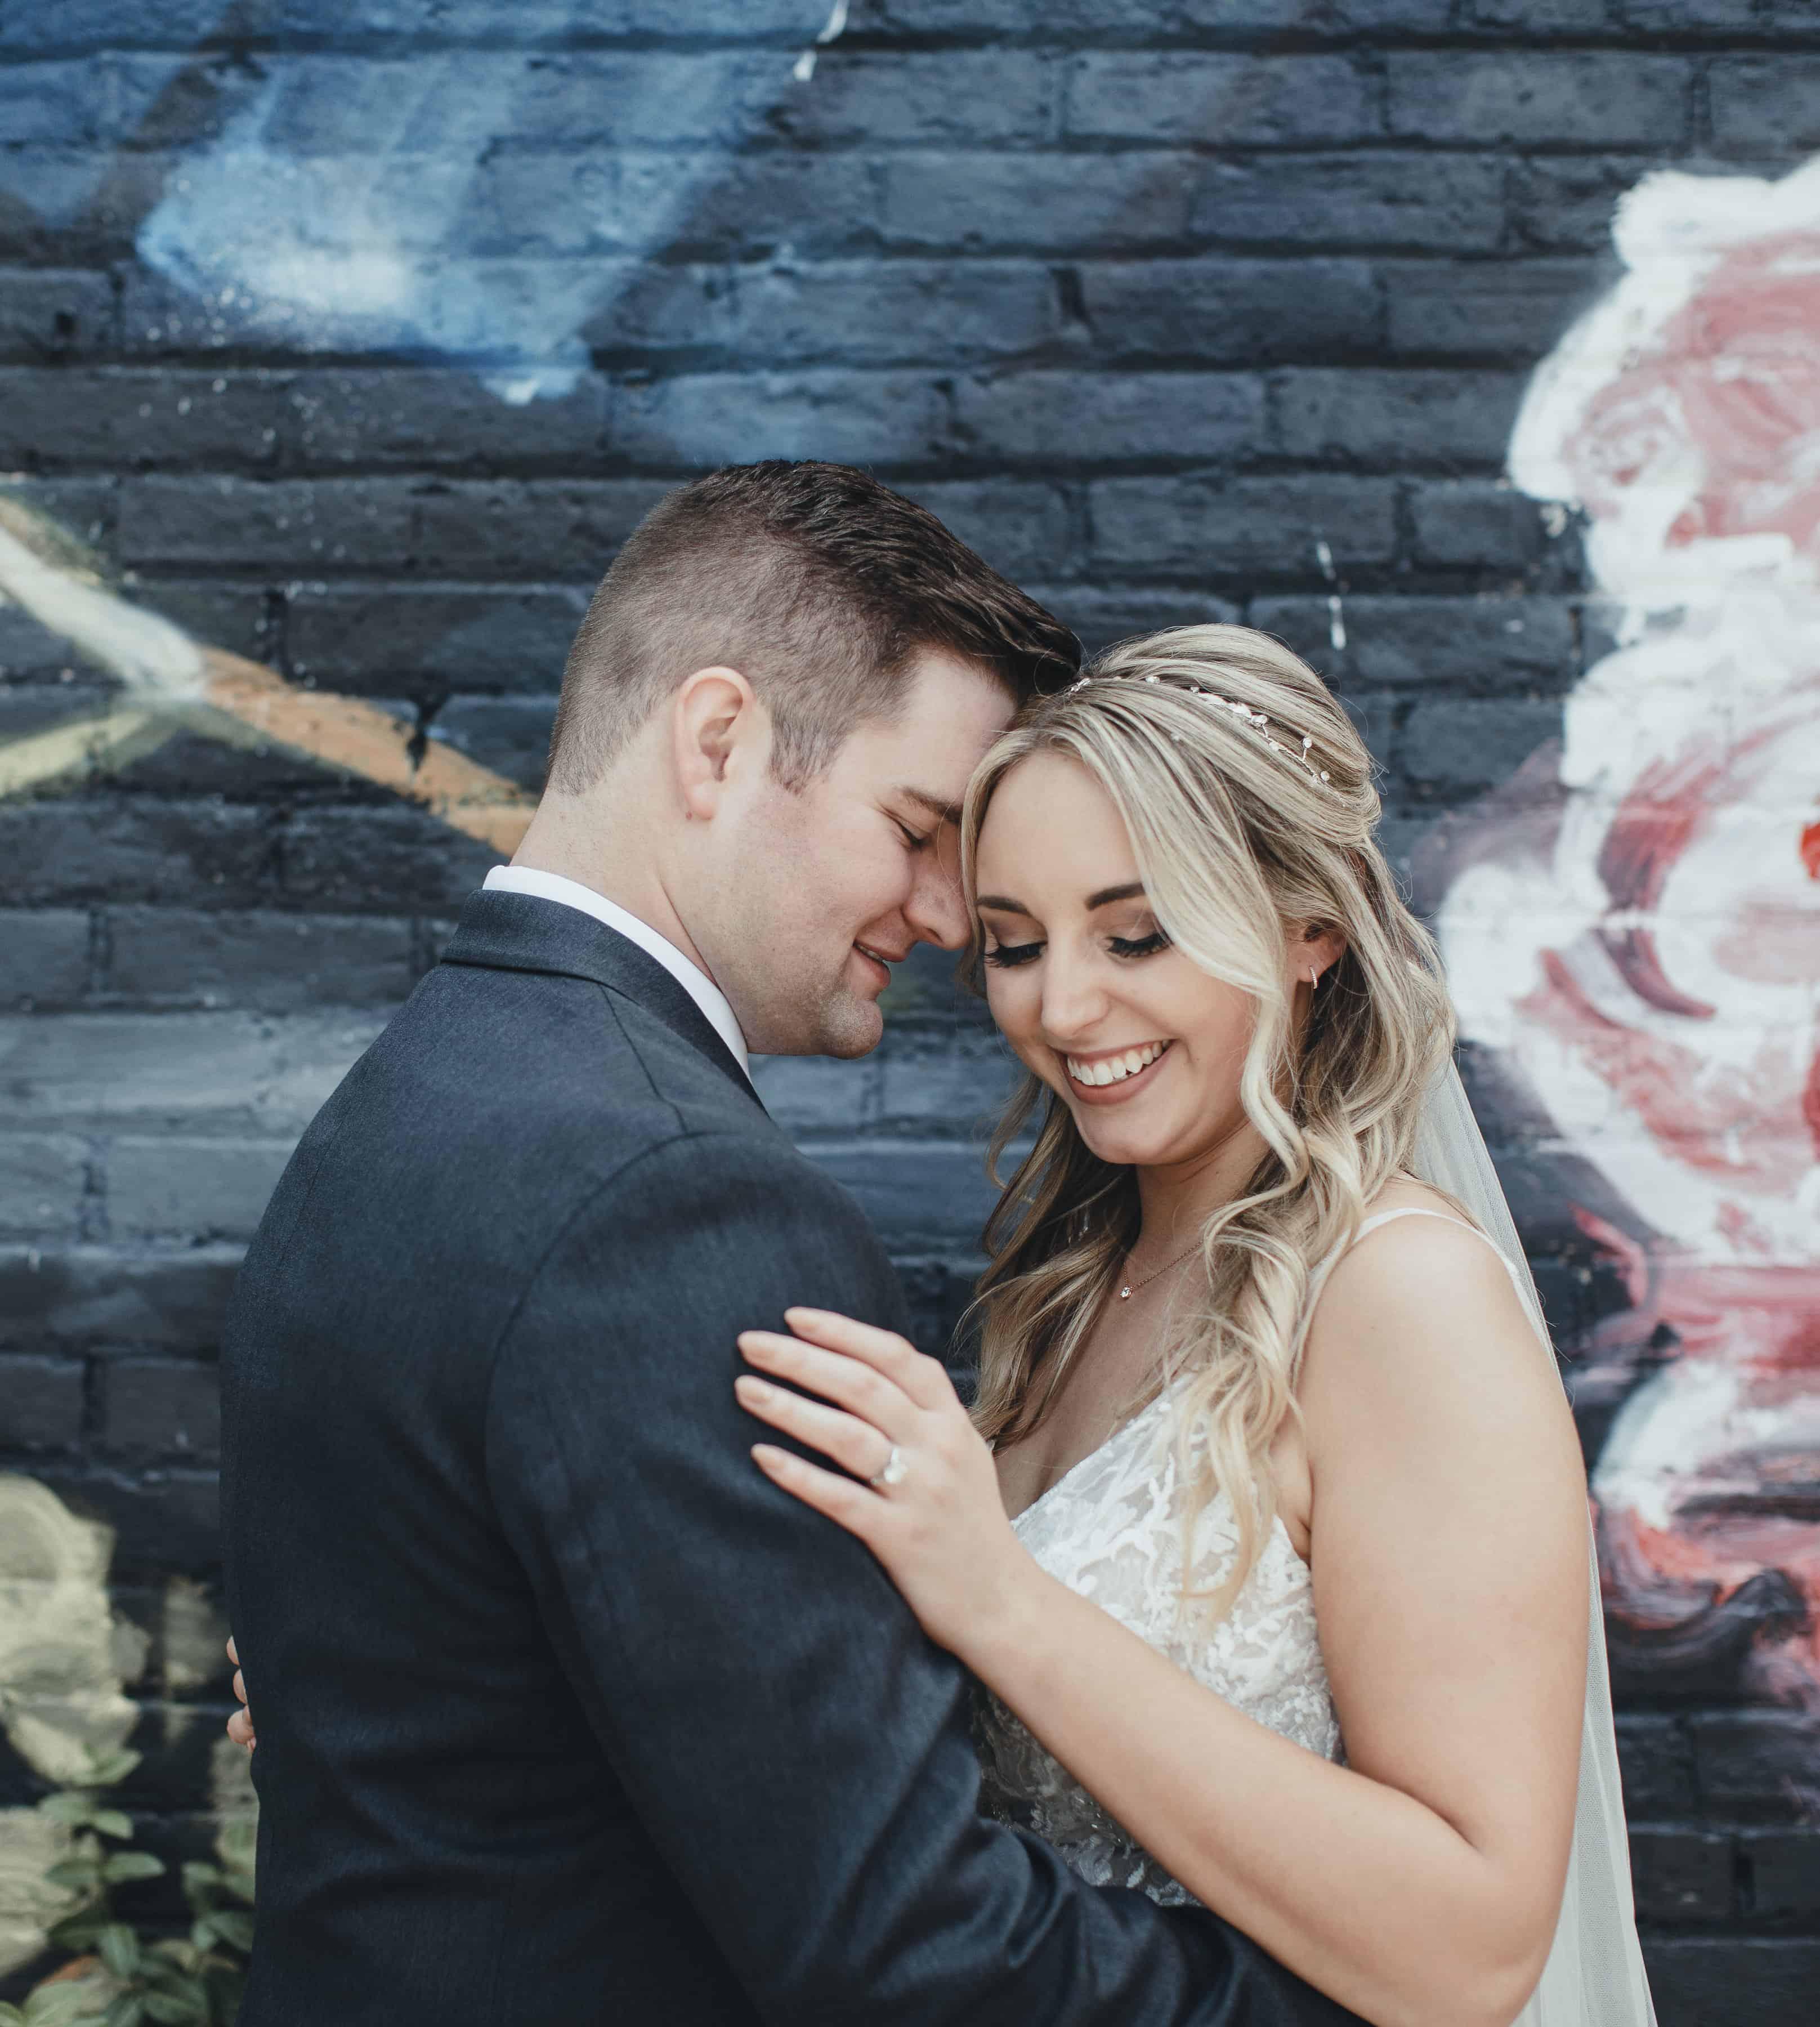 romantic summer wedding- Kingston ny